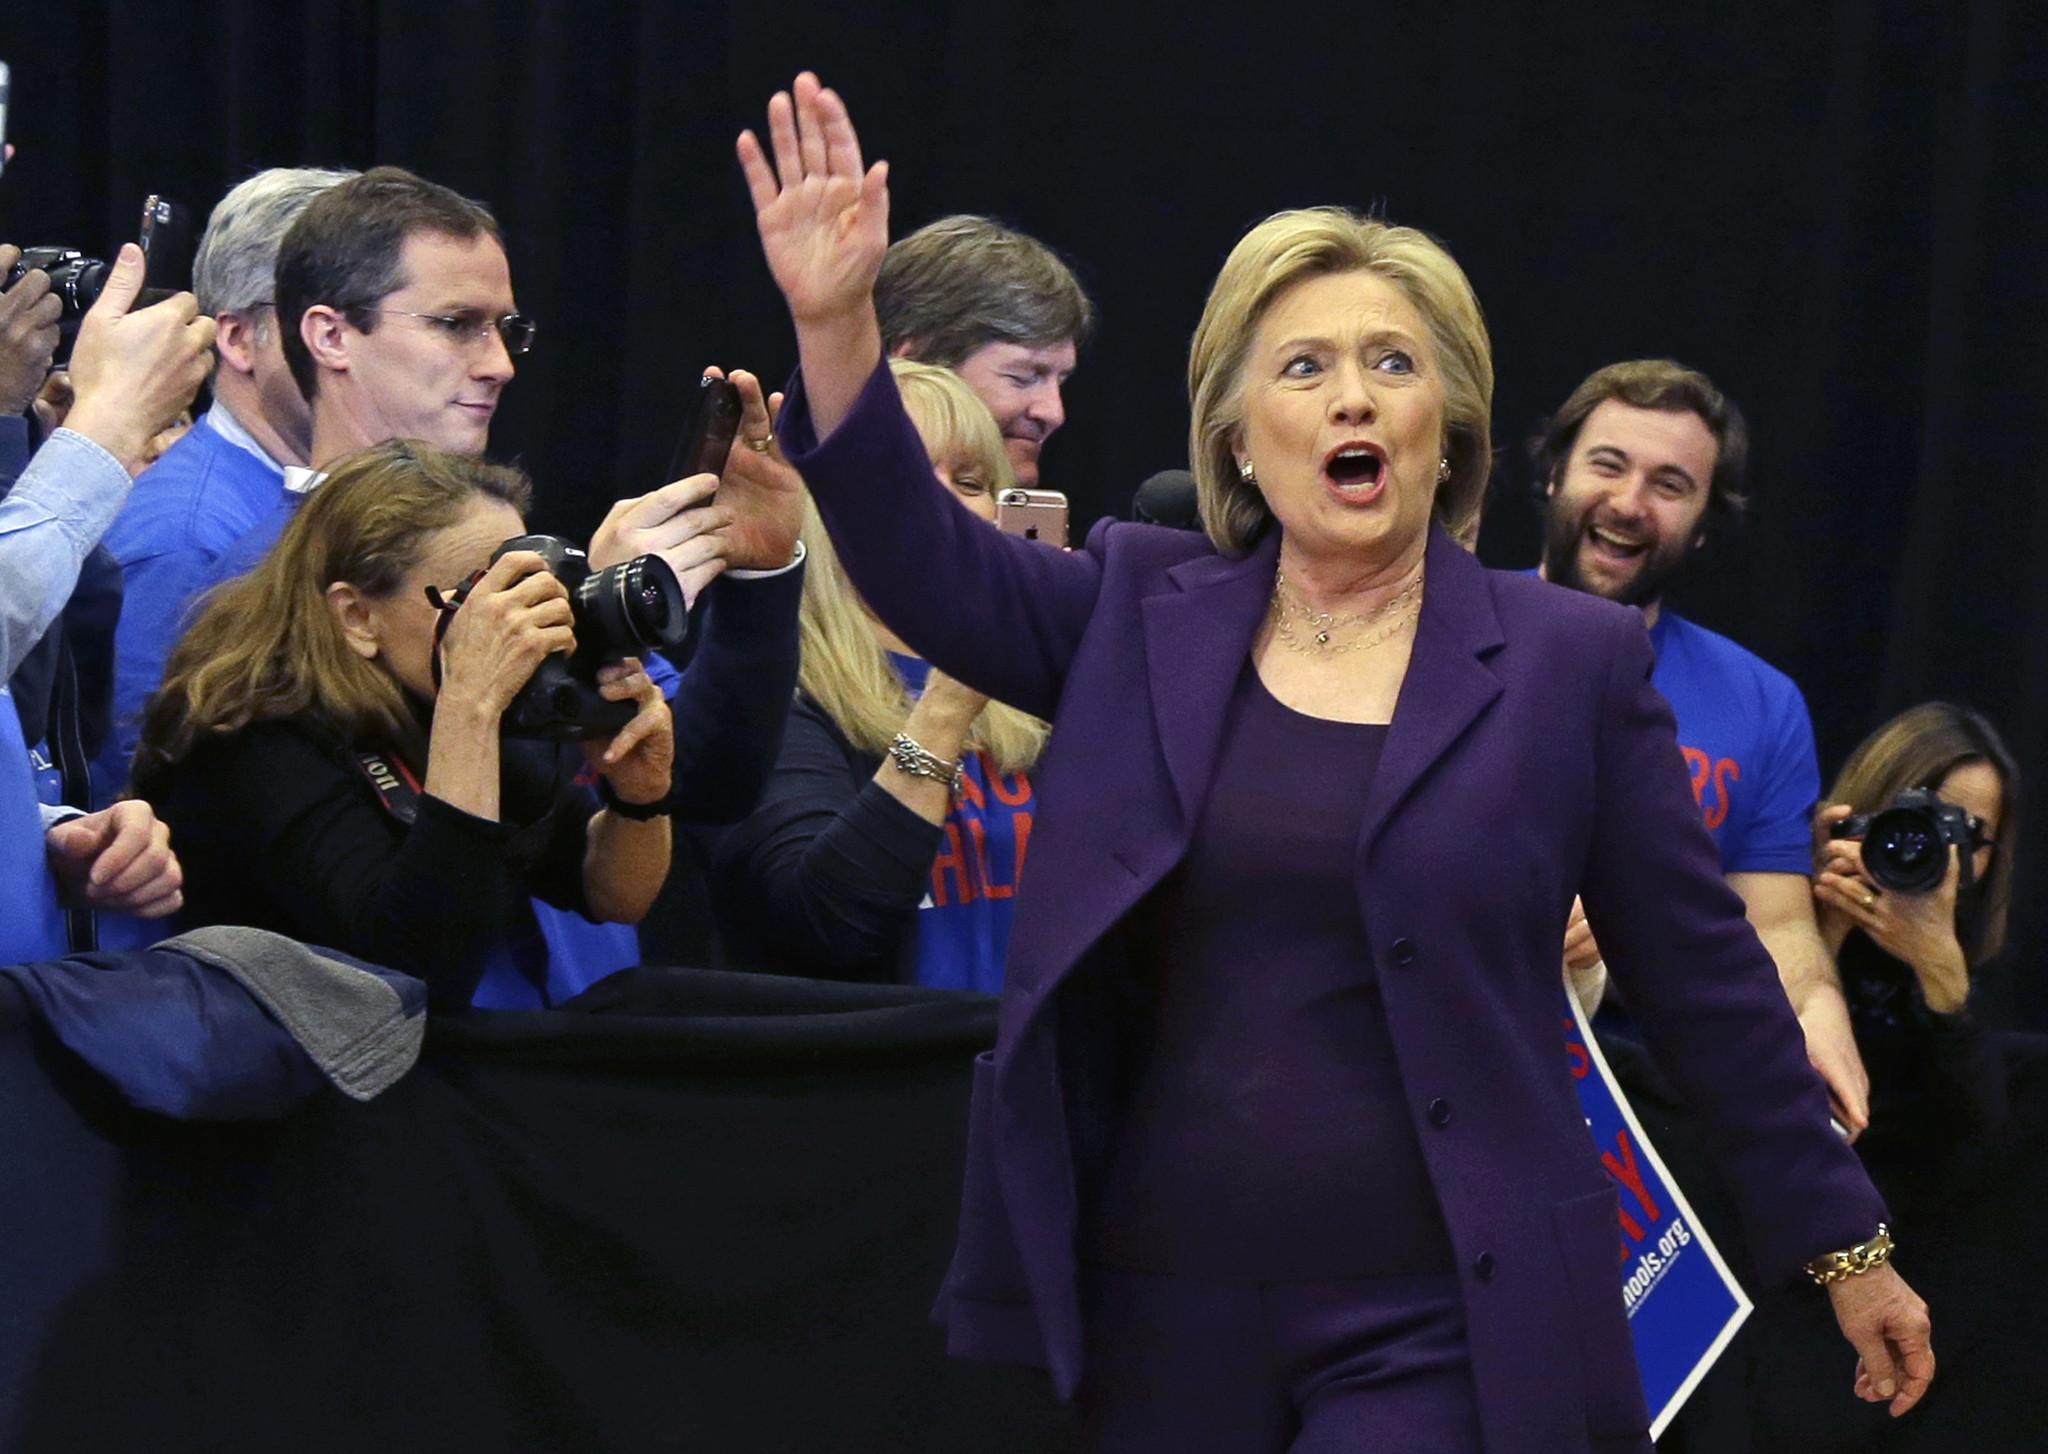 Hillary Clinton wins Iowa, campaigns turn to New Hampshire